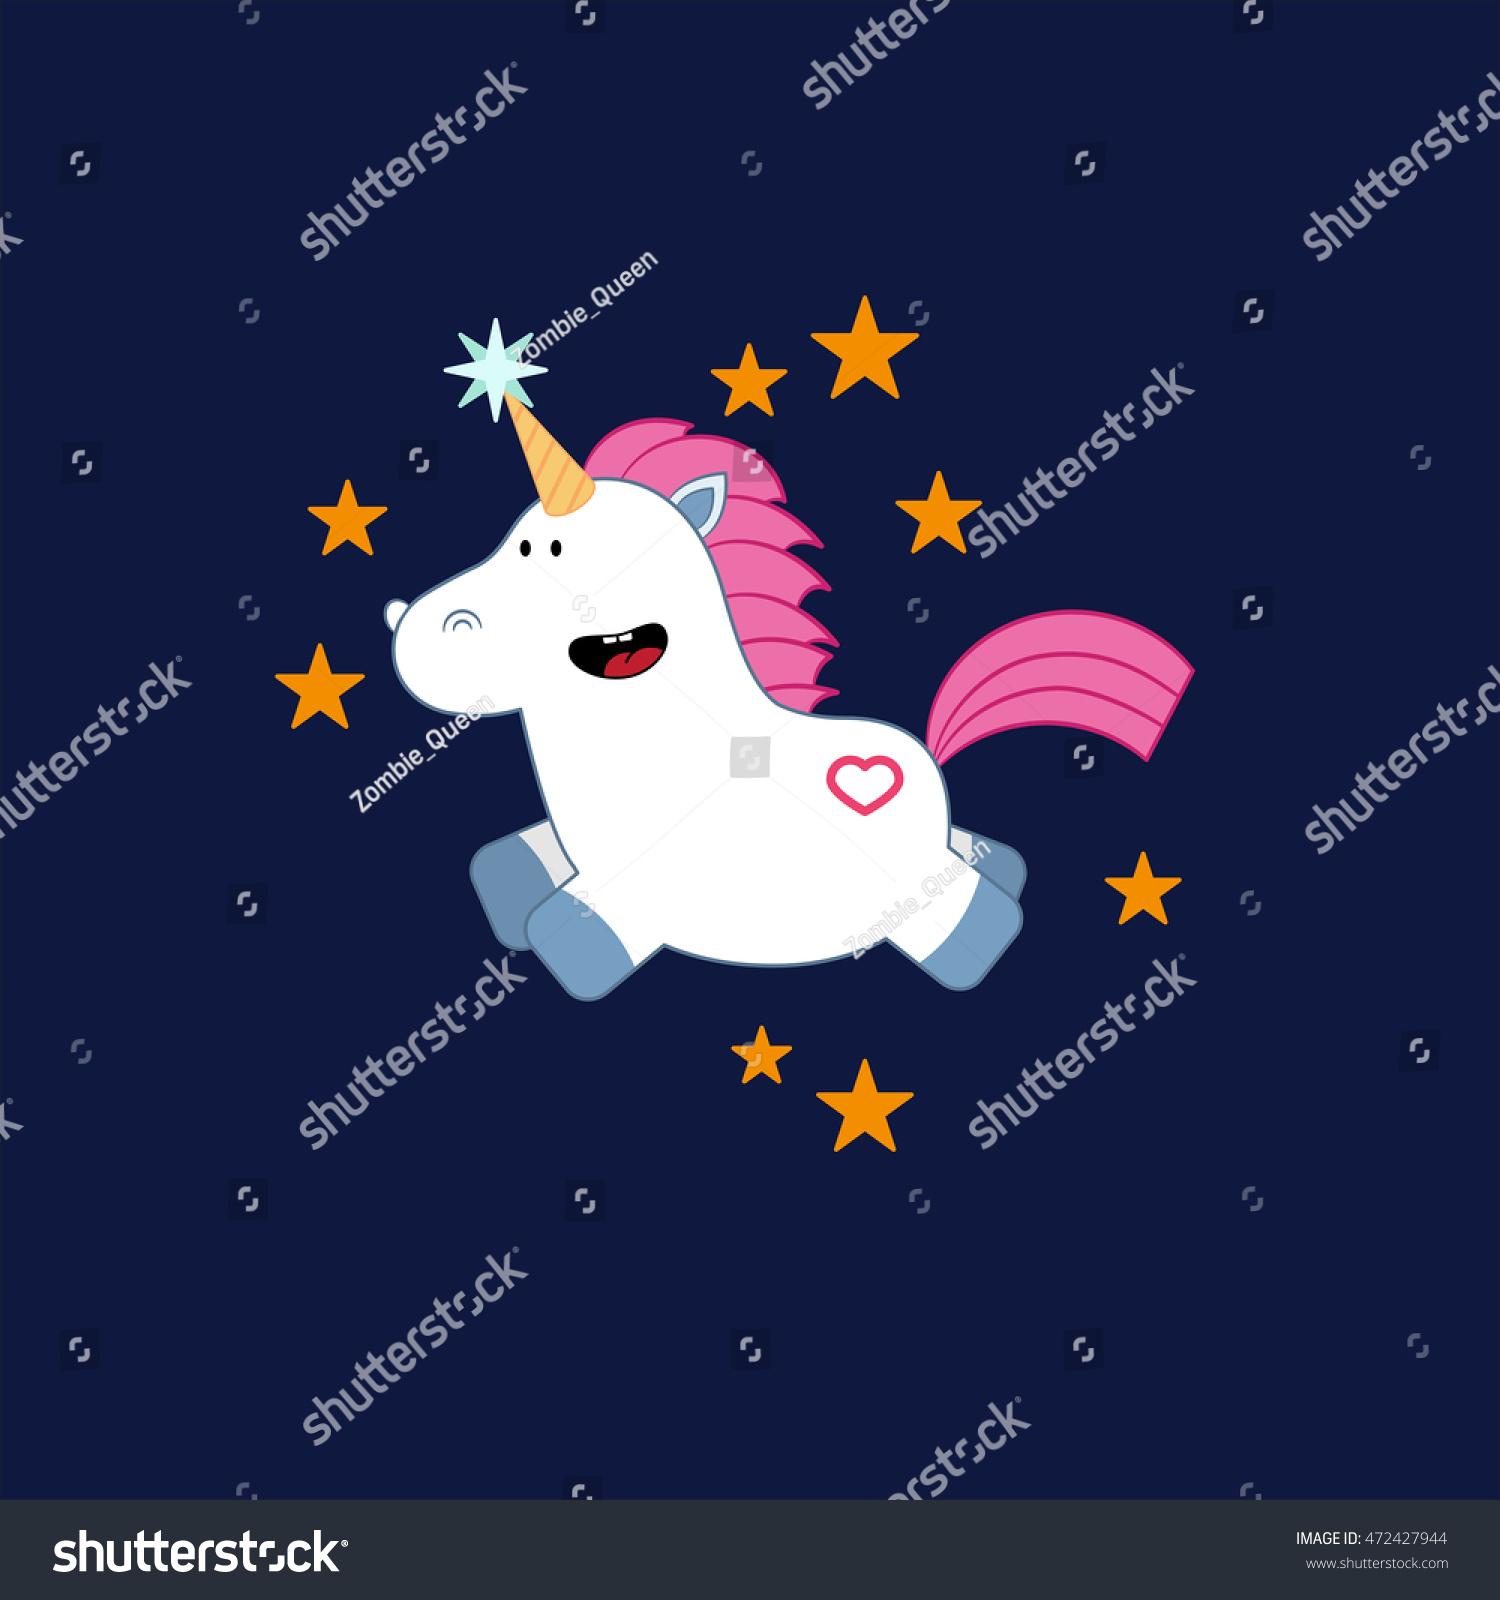 unicorn birthday card template dark background stock vector royalty